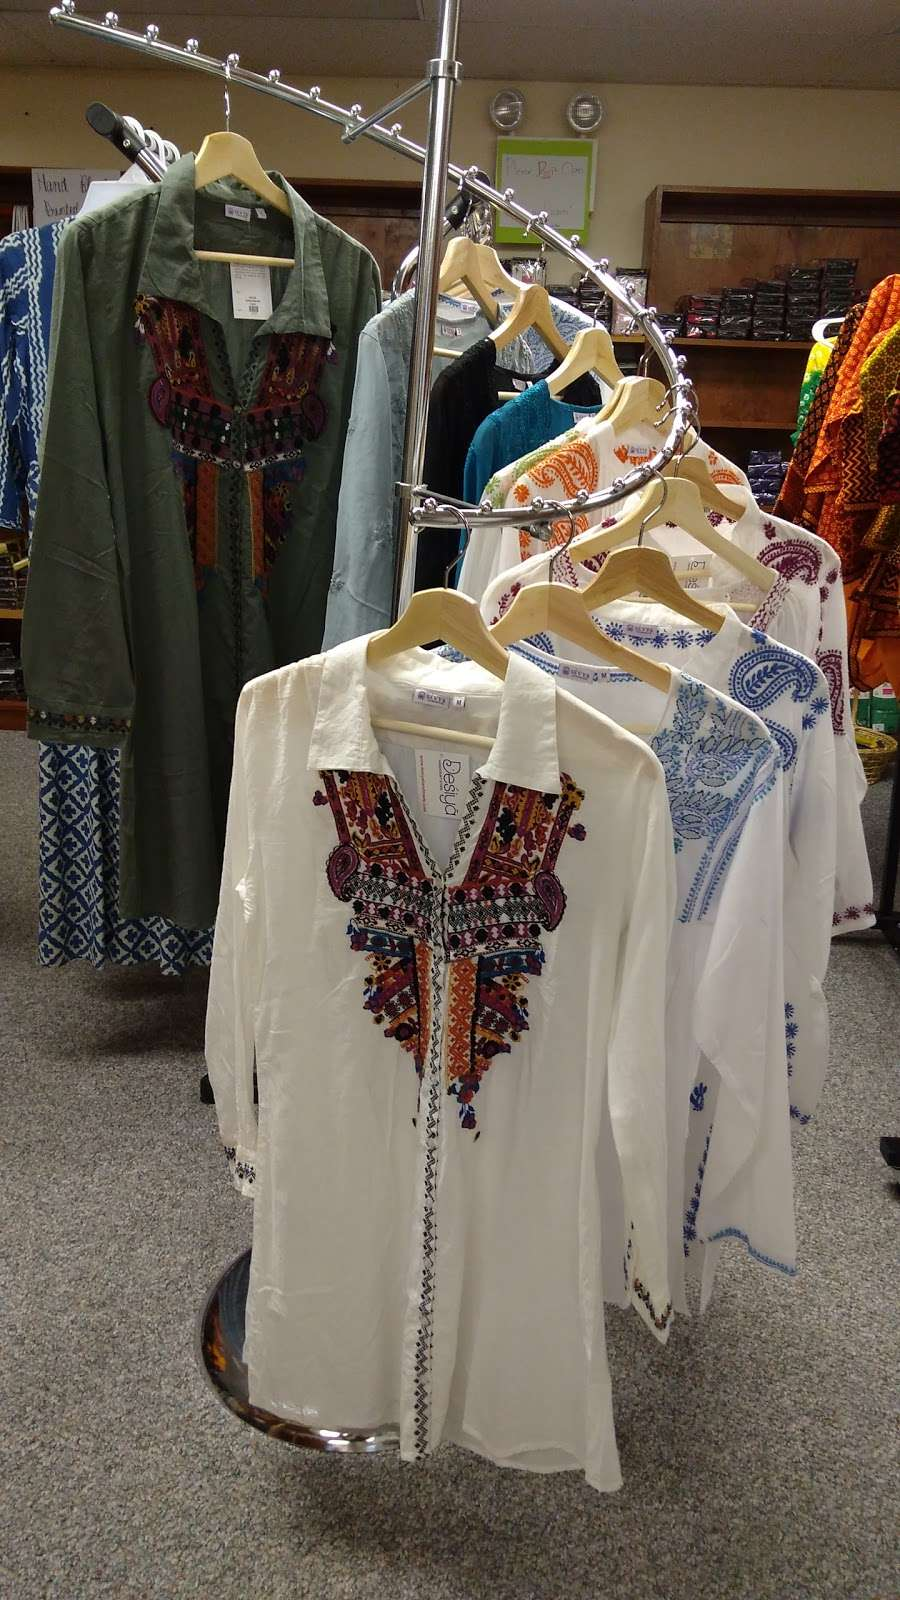 Desiya Handicraft Store - store  | Photo 8 of 10 | Address: 651 State Rte 115, Saylorsburg, PA 18353, USA | Phone: (570) 730-9849